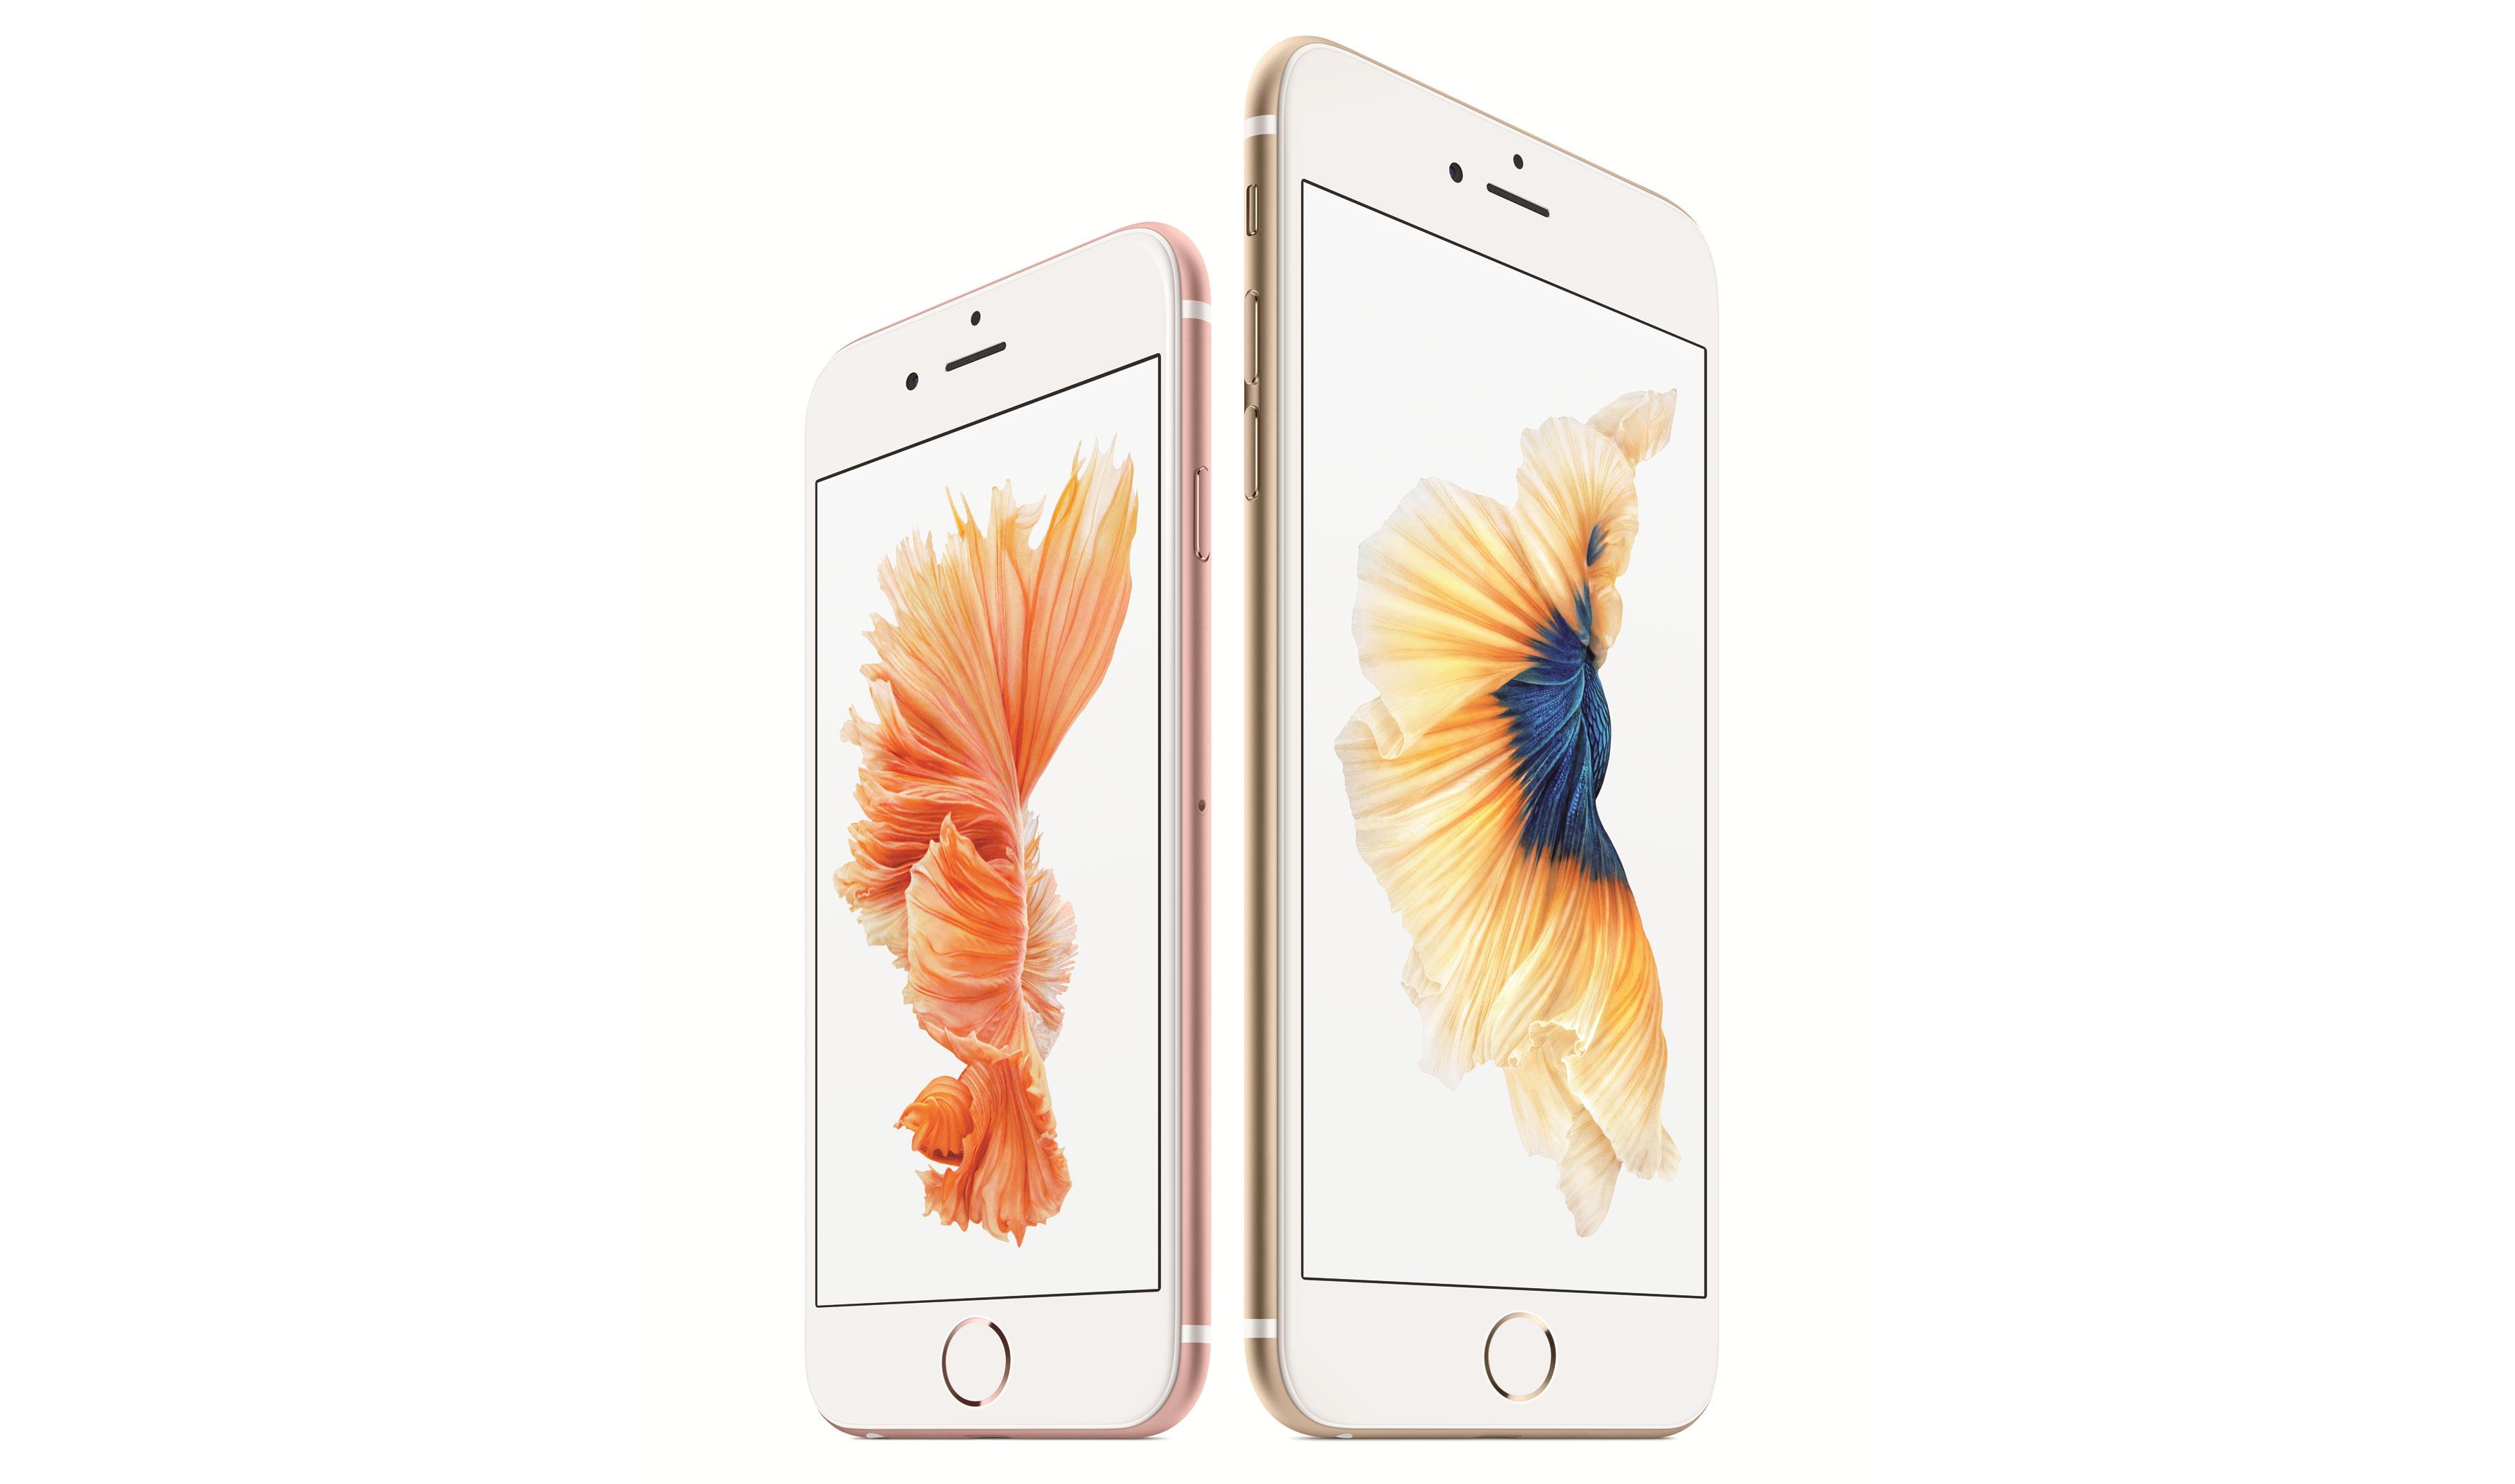 Sfondi 6s Iphone 6s Iphone Più Mela 3568x2106 4kwallpaper